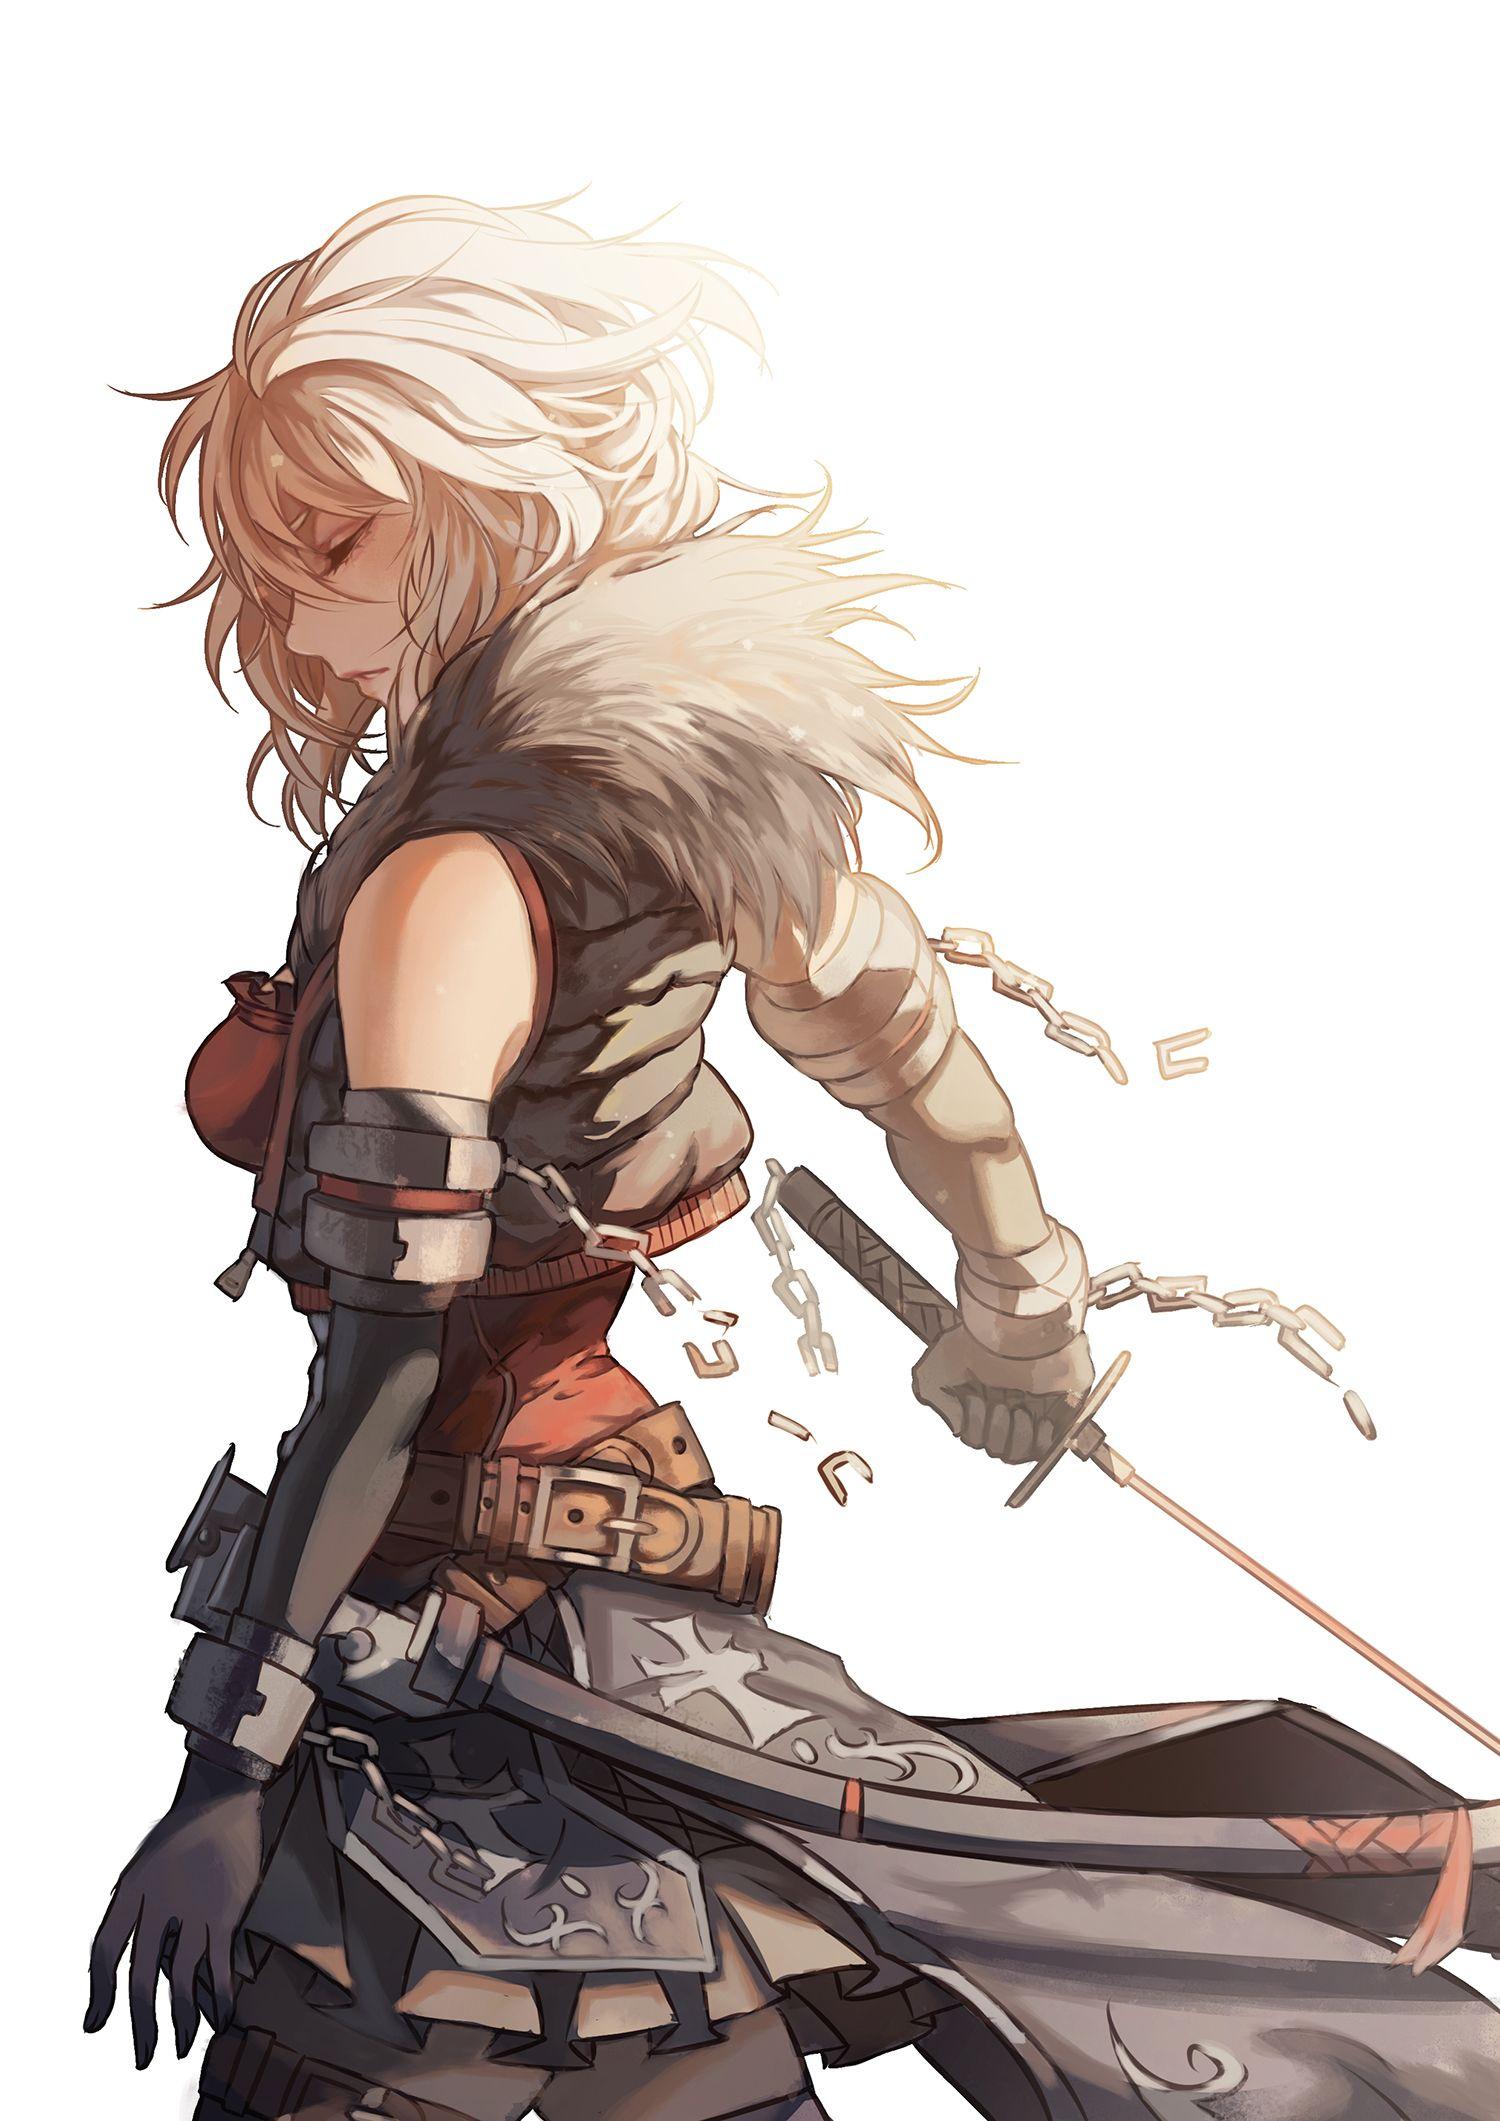 Pin By D Apriliana On Oc S Anime Warrior Warrior Woman Fantasy Character Design